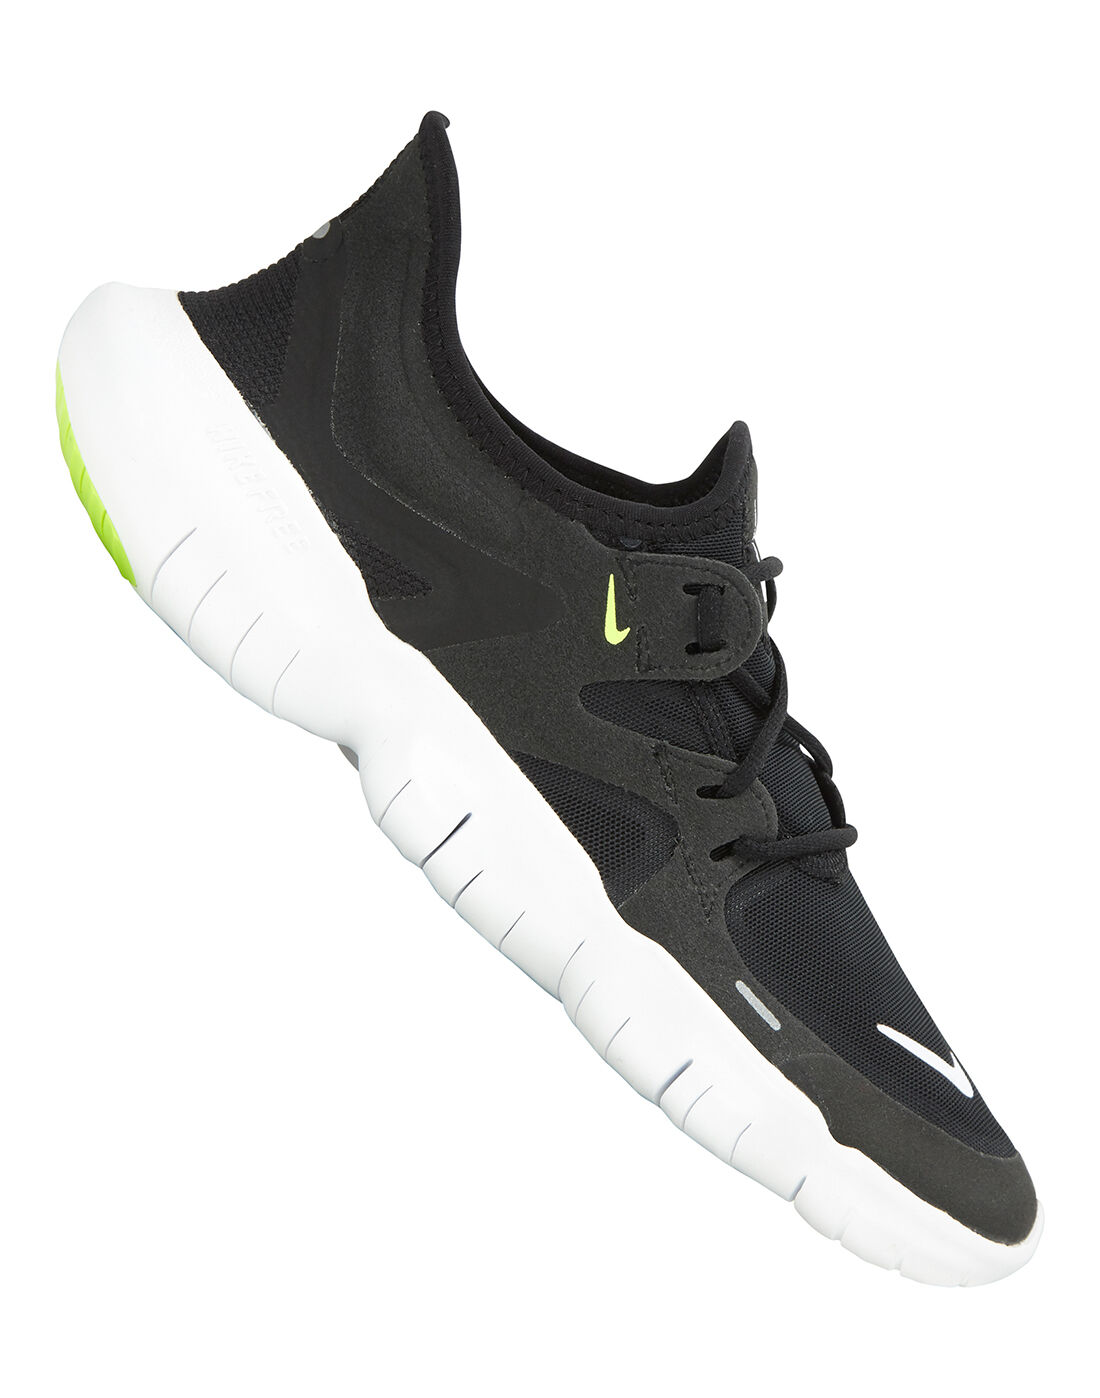 Nike Free RN 5.0 Running Shoes SU19